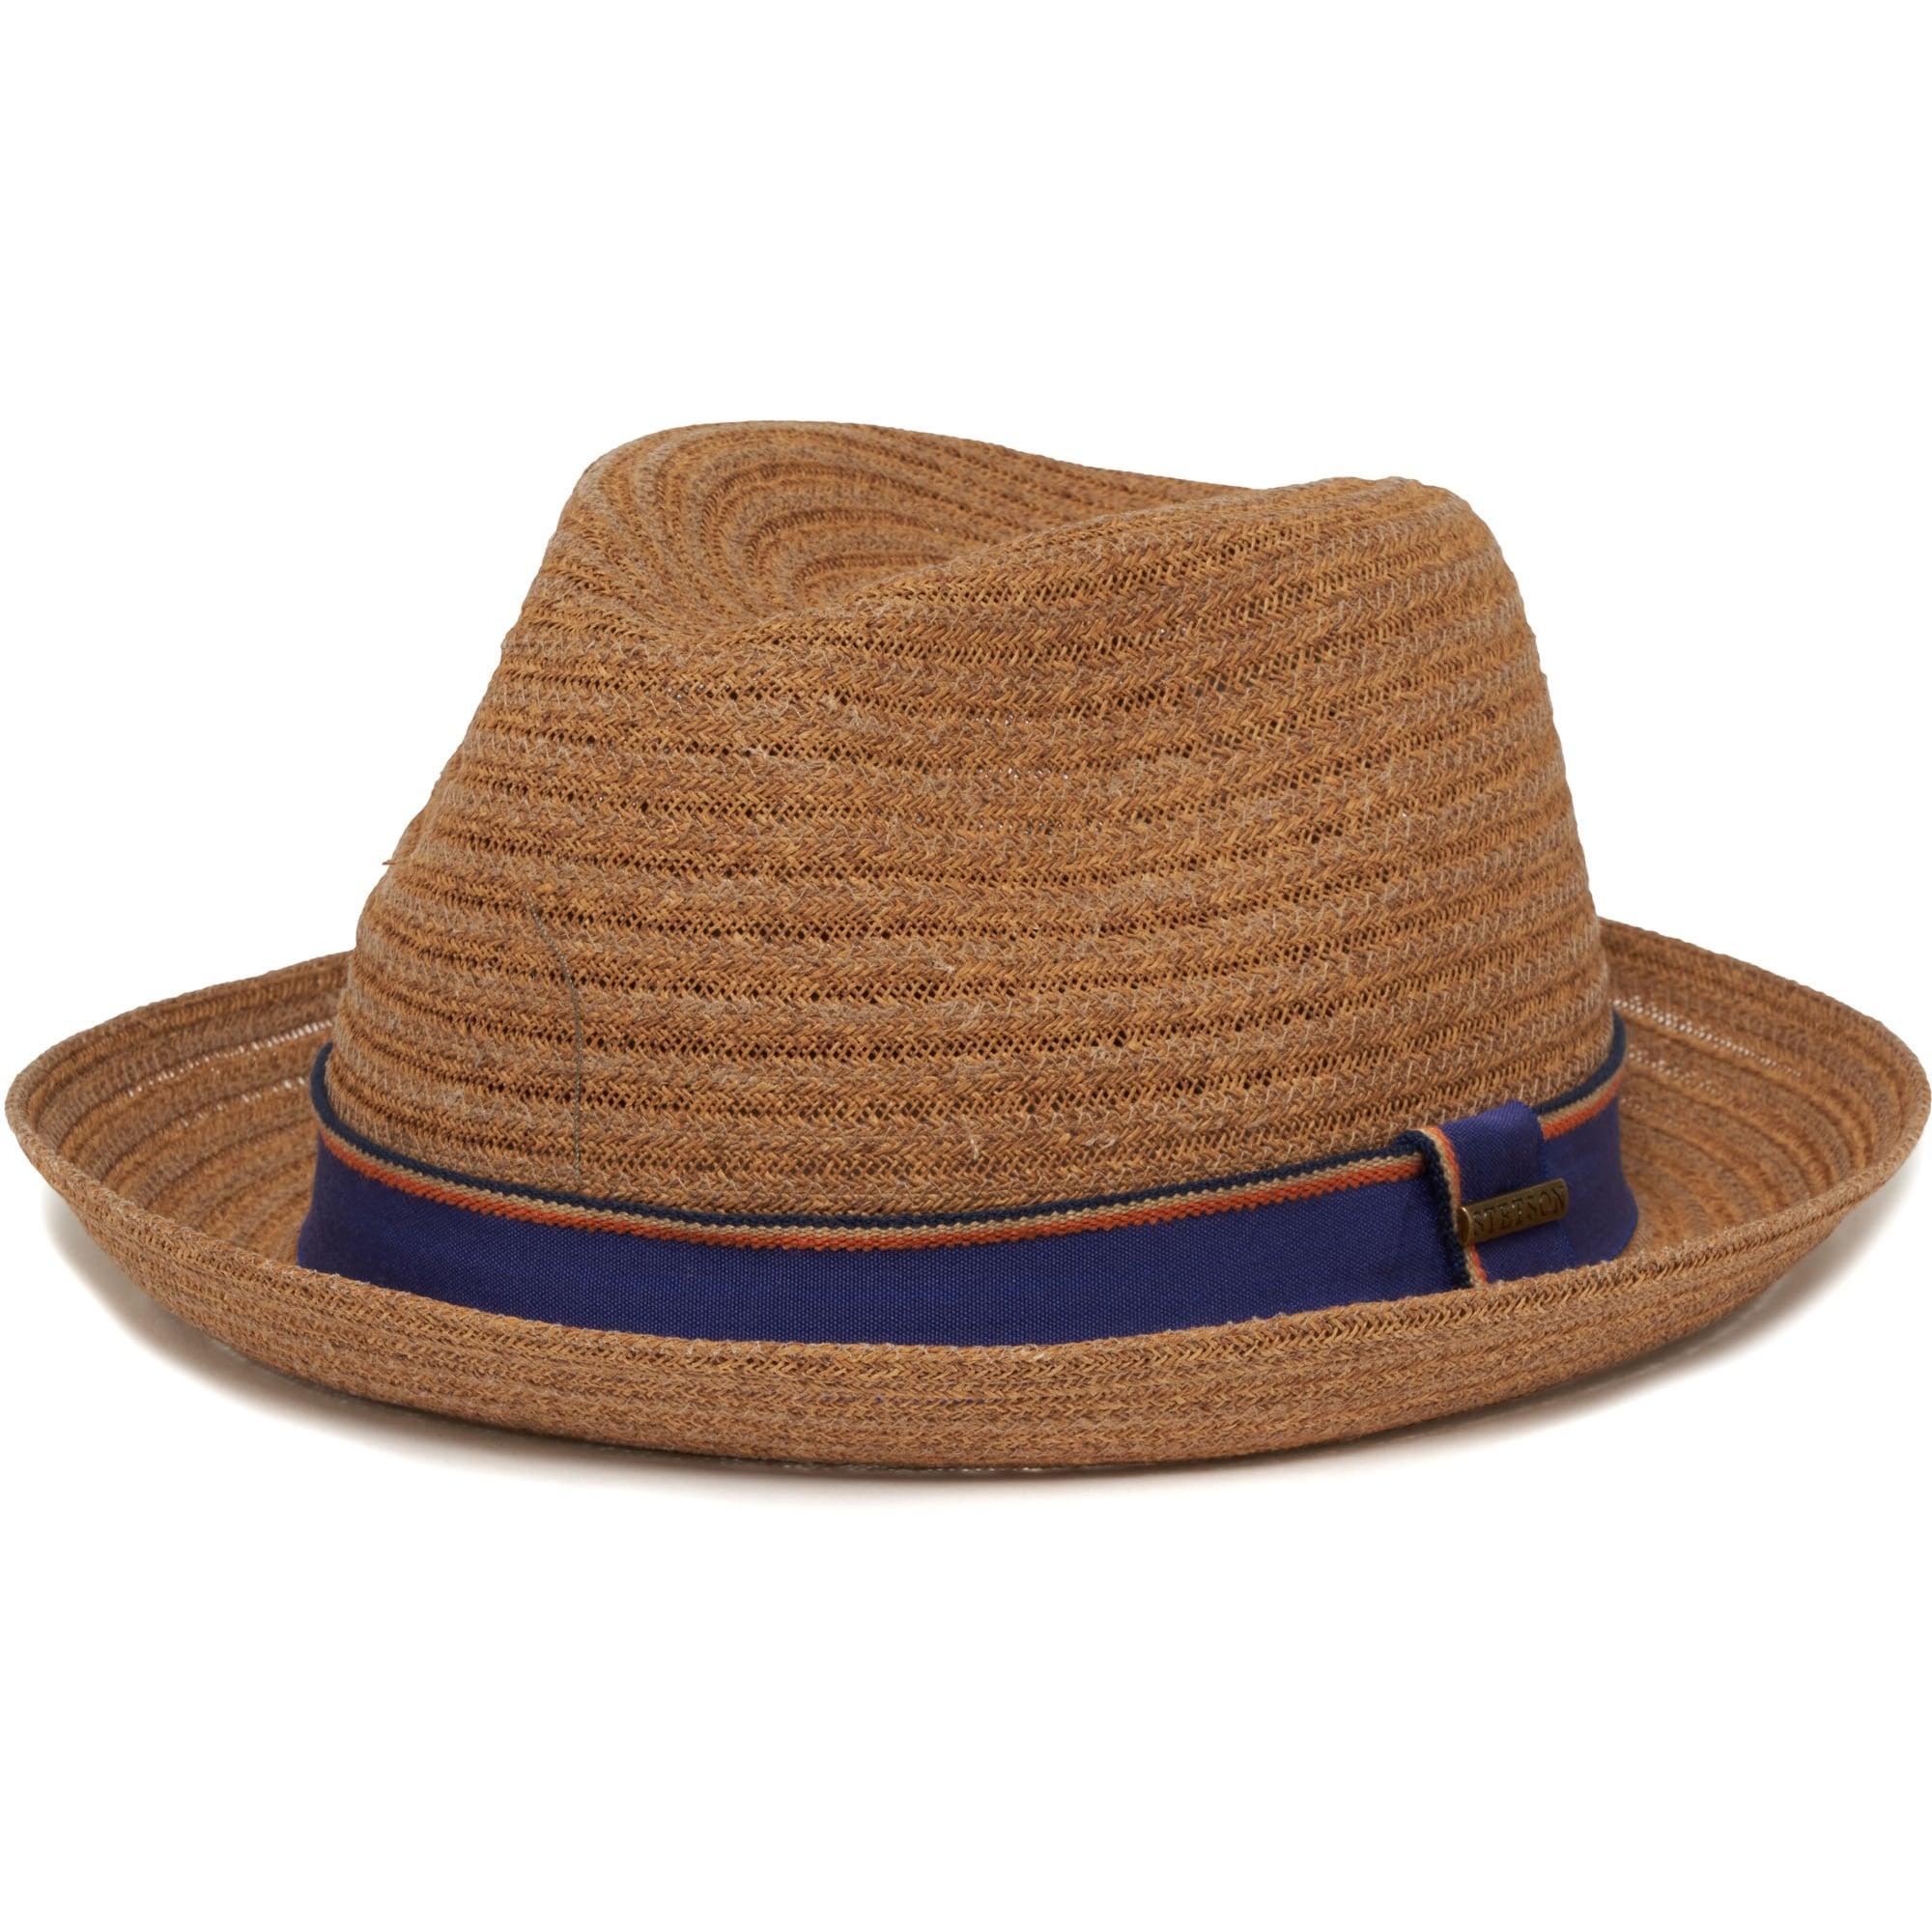 Stetson Brown Collano Diamond Player Toyo Straw Hat  750ce57fc48